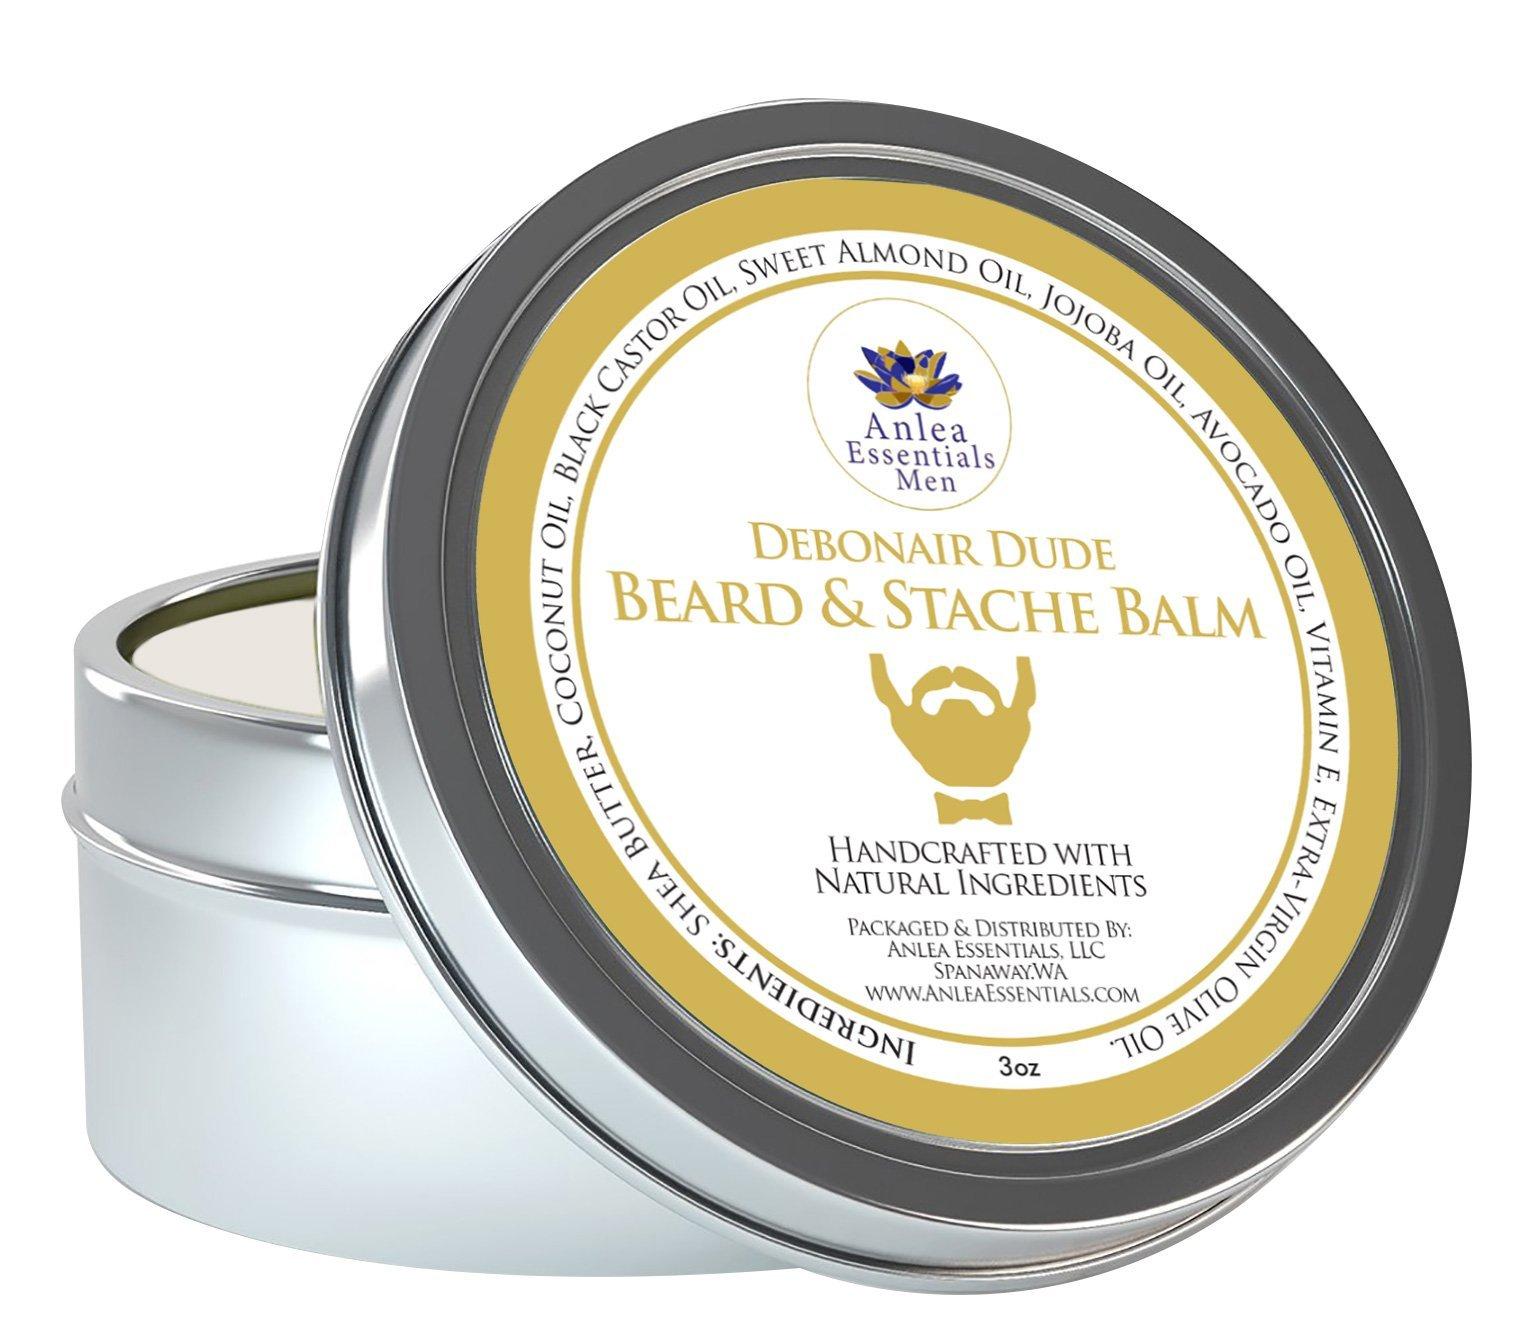 Anlea Essentials Men Debonair Dude Beard & Stache Balm